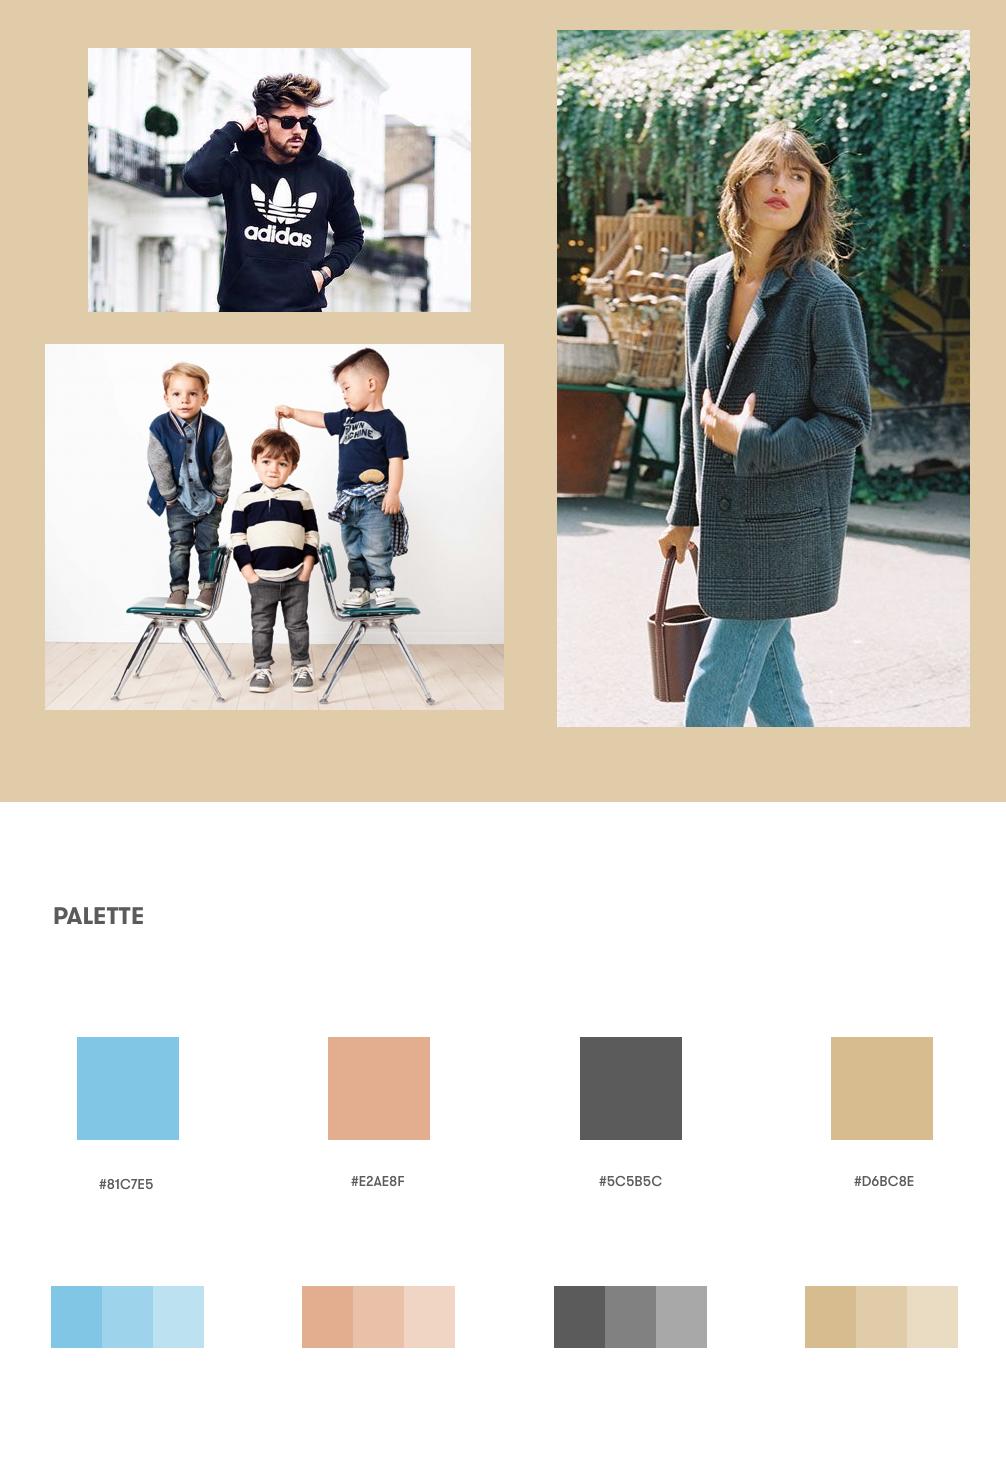 Palette&Images.png